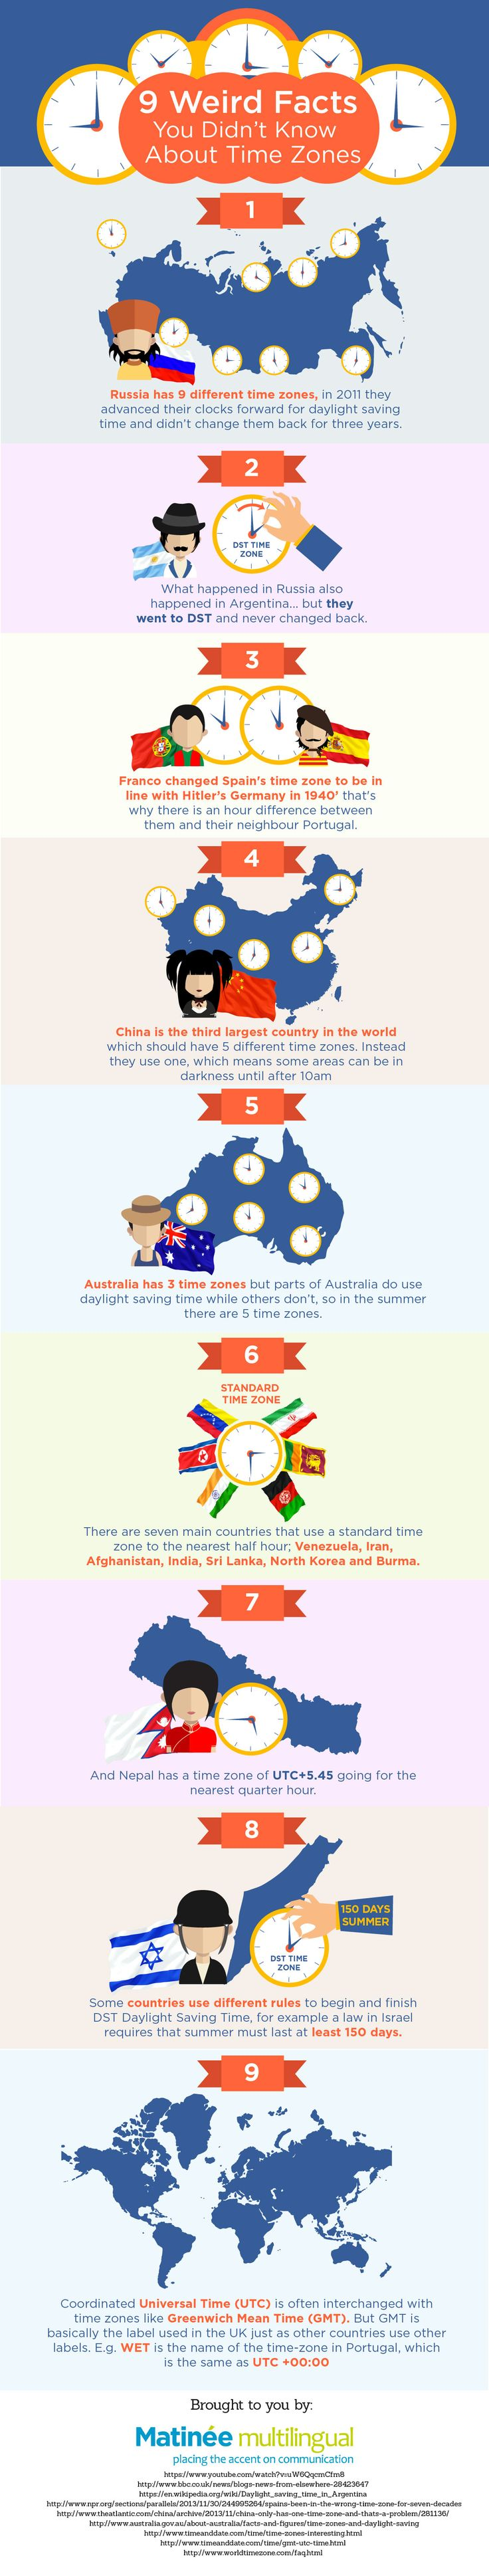 Best  Us Daylight Savings Time Ideas On Pinterest - Map of us time zones during daylight savings